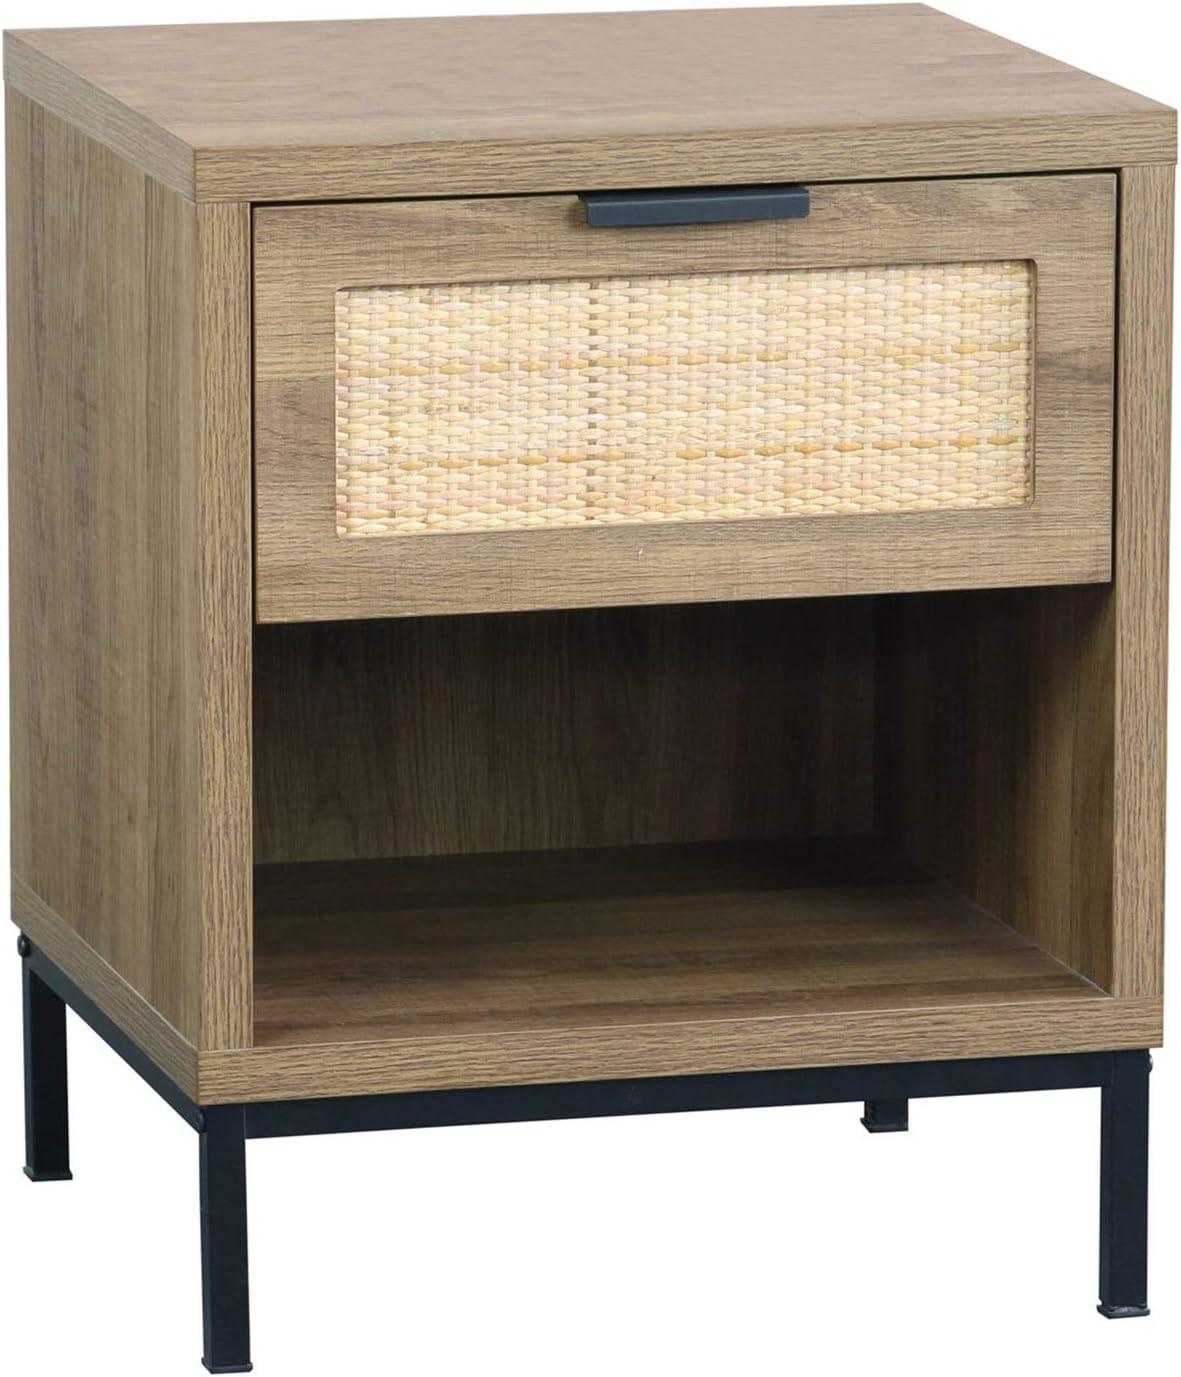 Rattan Drawer Dedication Nightstand Anmytek Bedroom Room Side Outlet ☆ Free Shipping Table Living